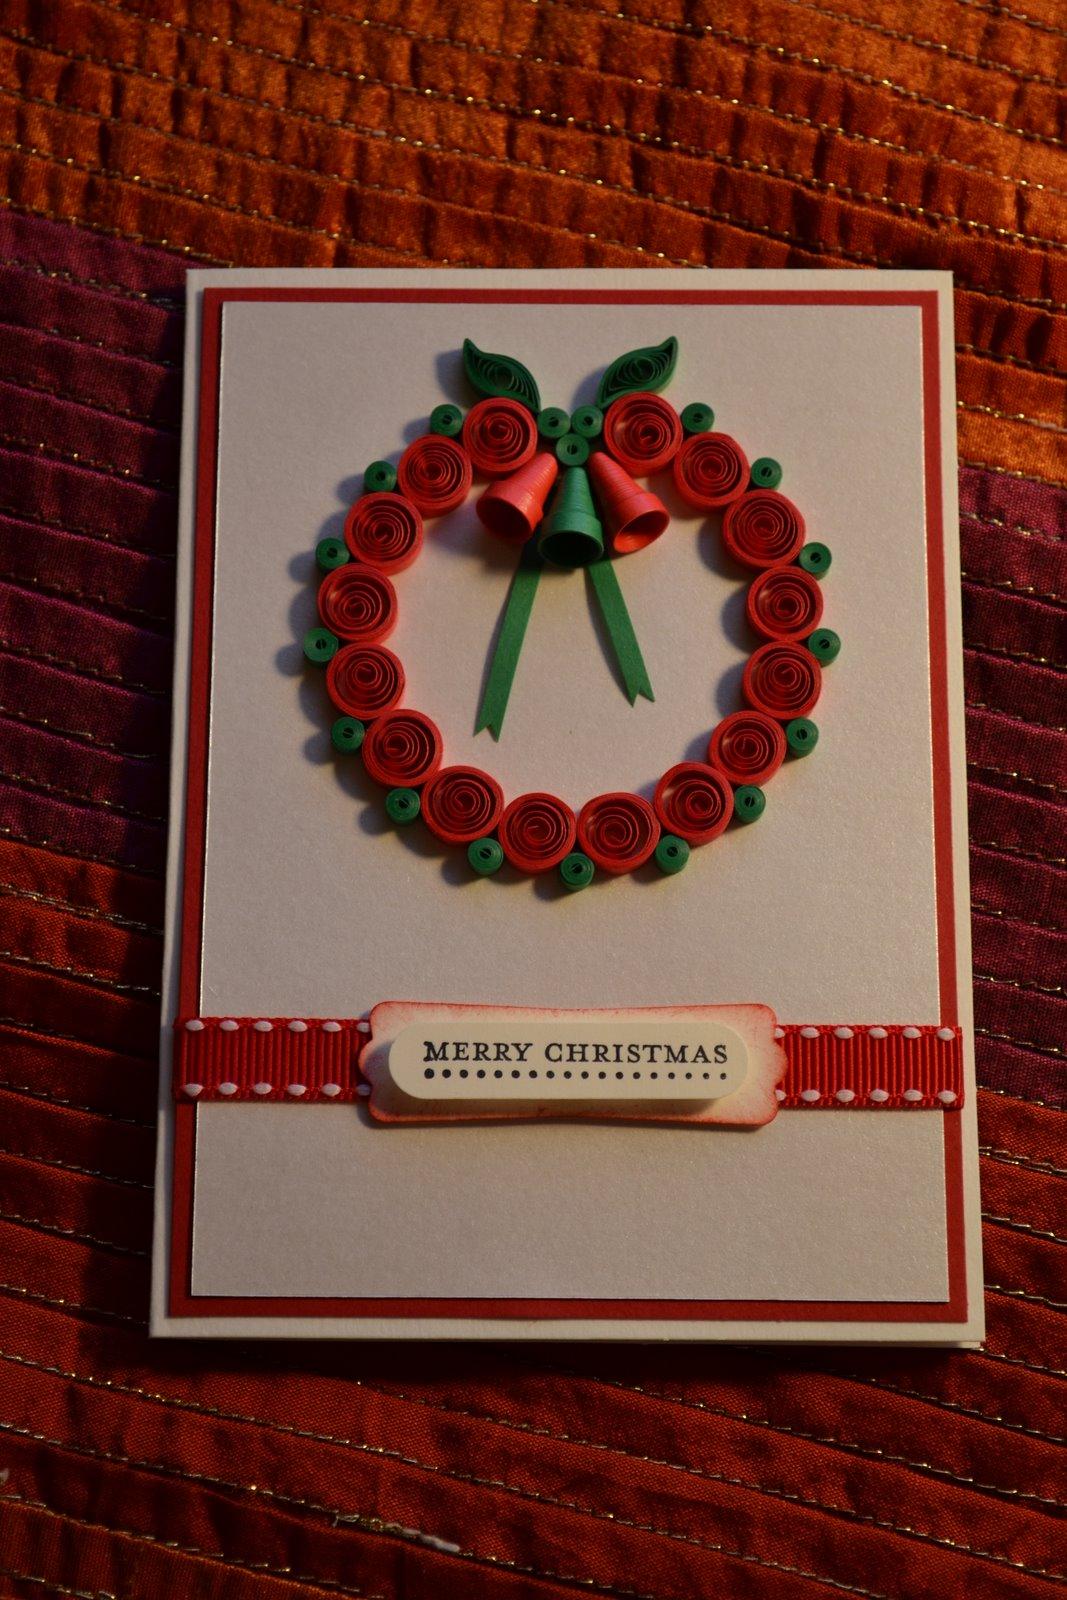 #711909 Quilling Ideas: Happy Holidays 6013 decoration de noel quilling 1067x1600 px @ aertt.com